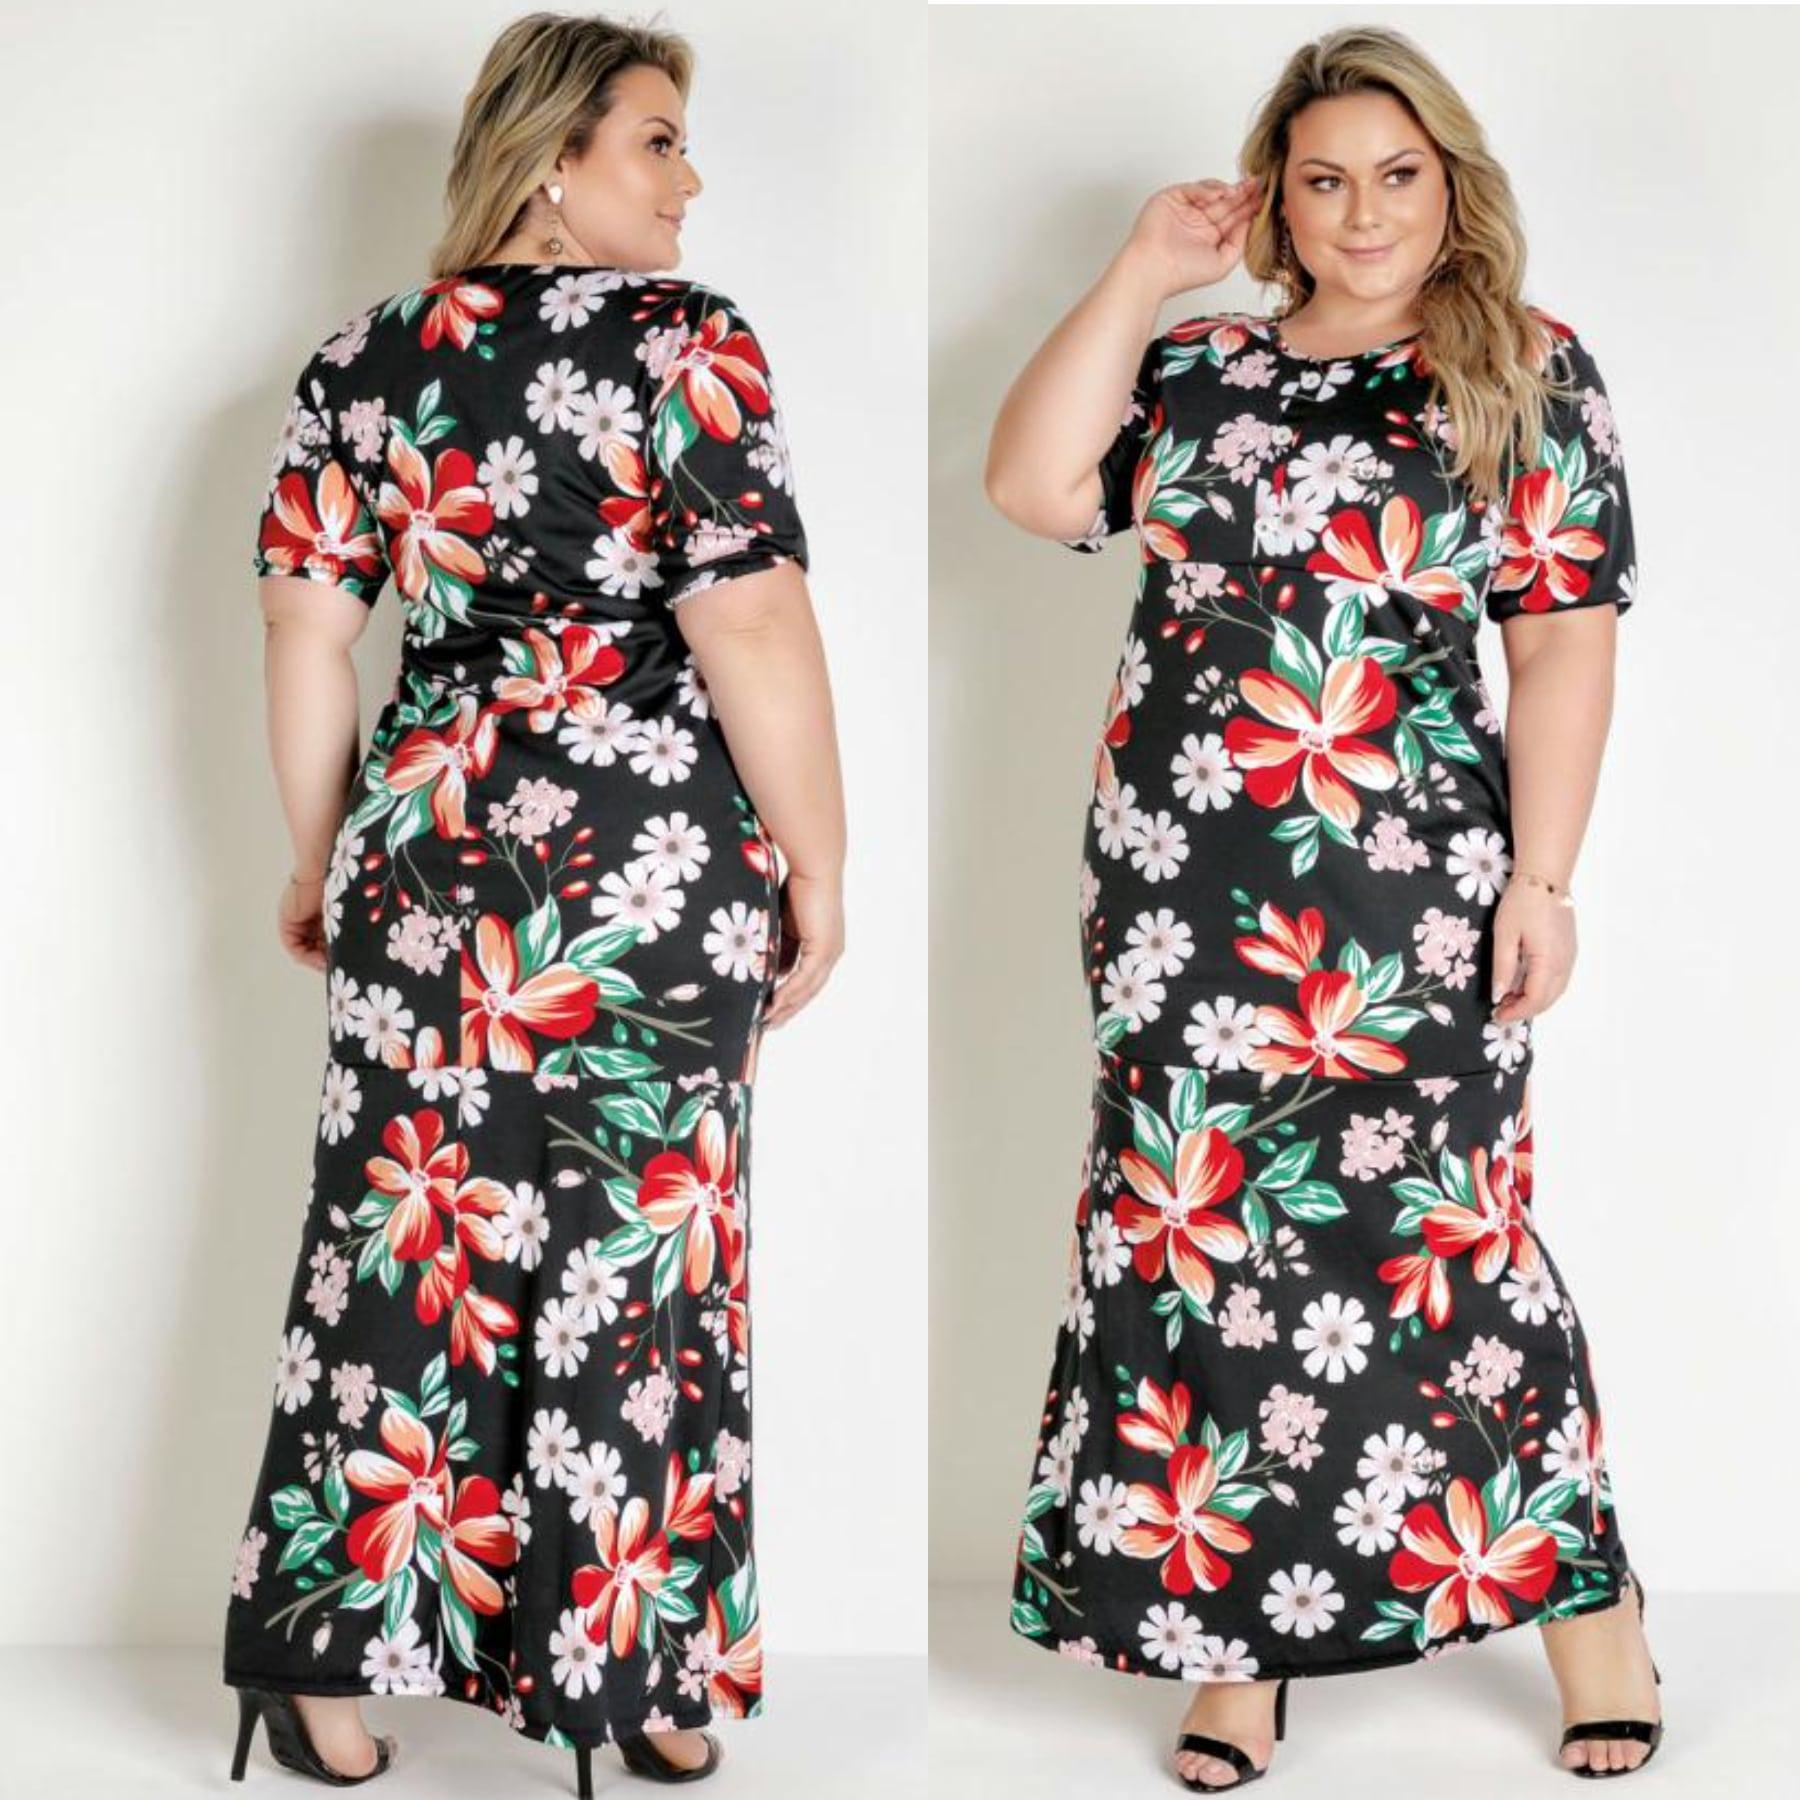 Vestido Longo Floral Preto com Botões Plus Size